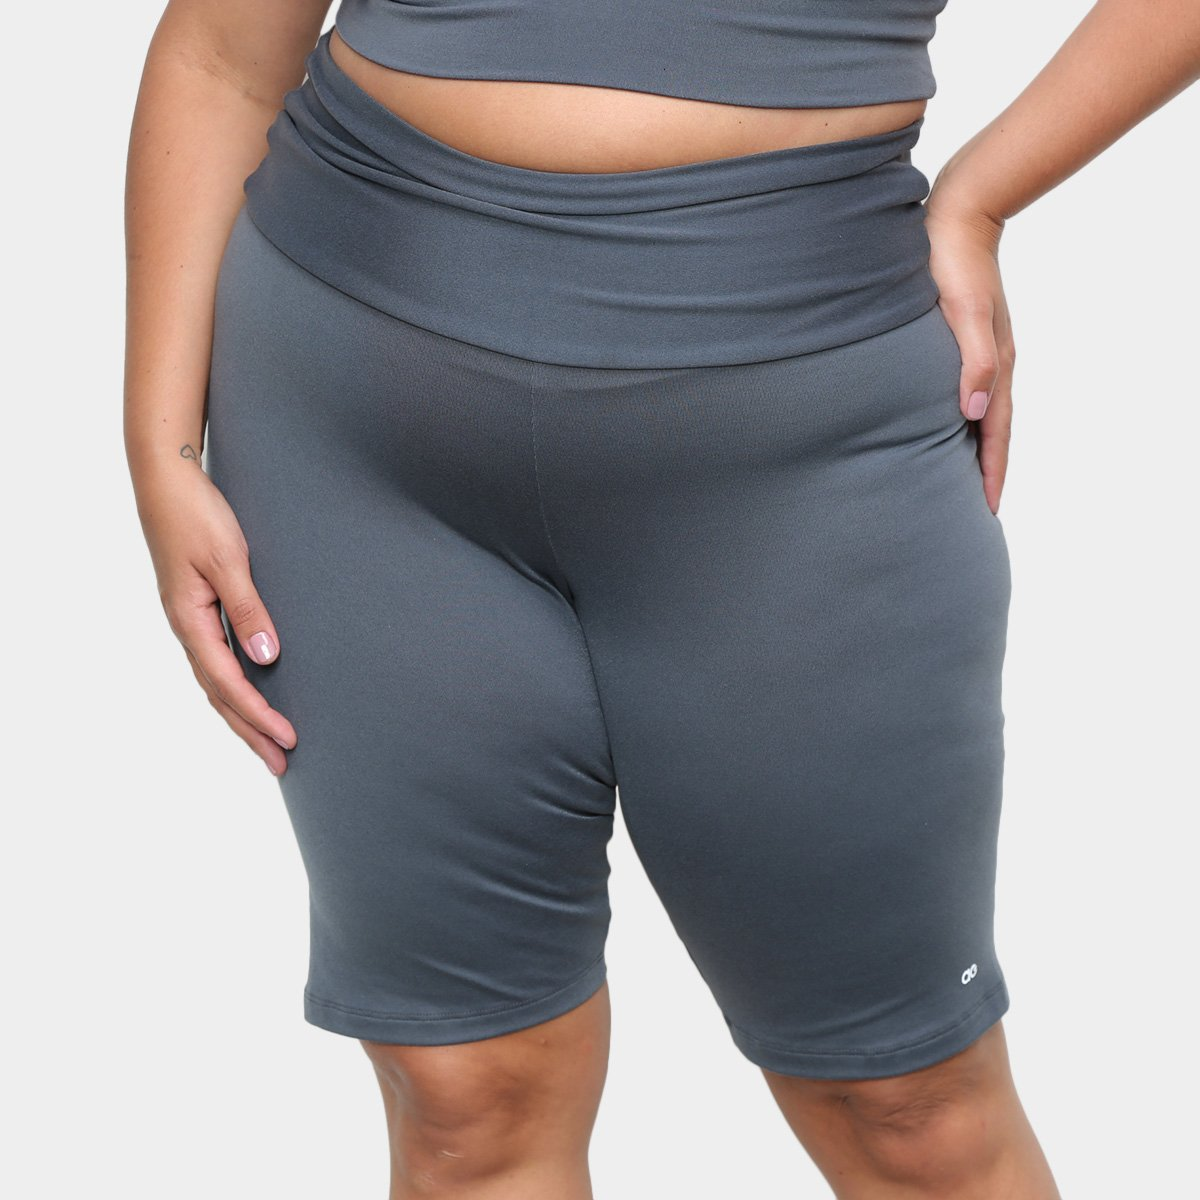 Bermuda Plus Size Alto Giro Supplex Cintura Alta Feminina